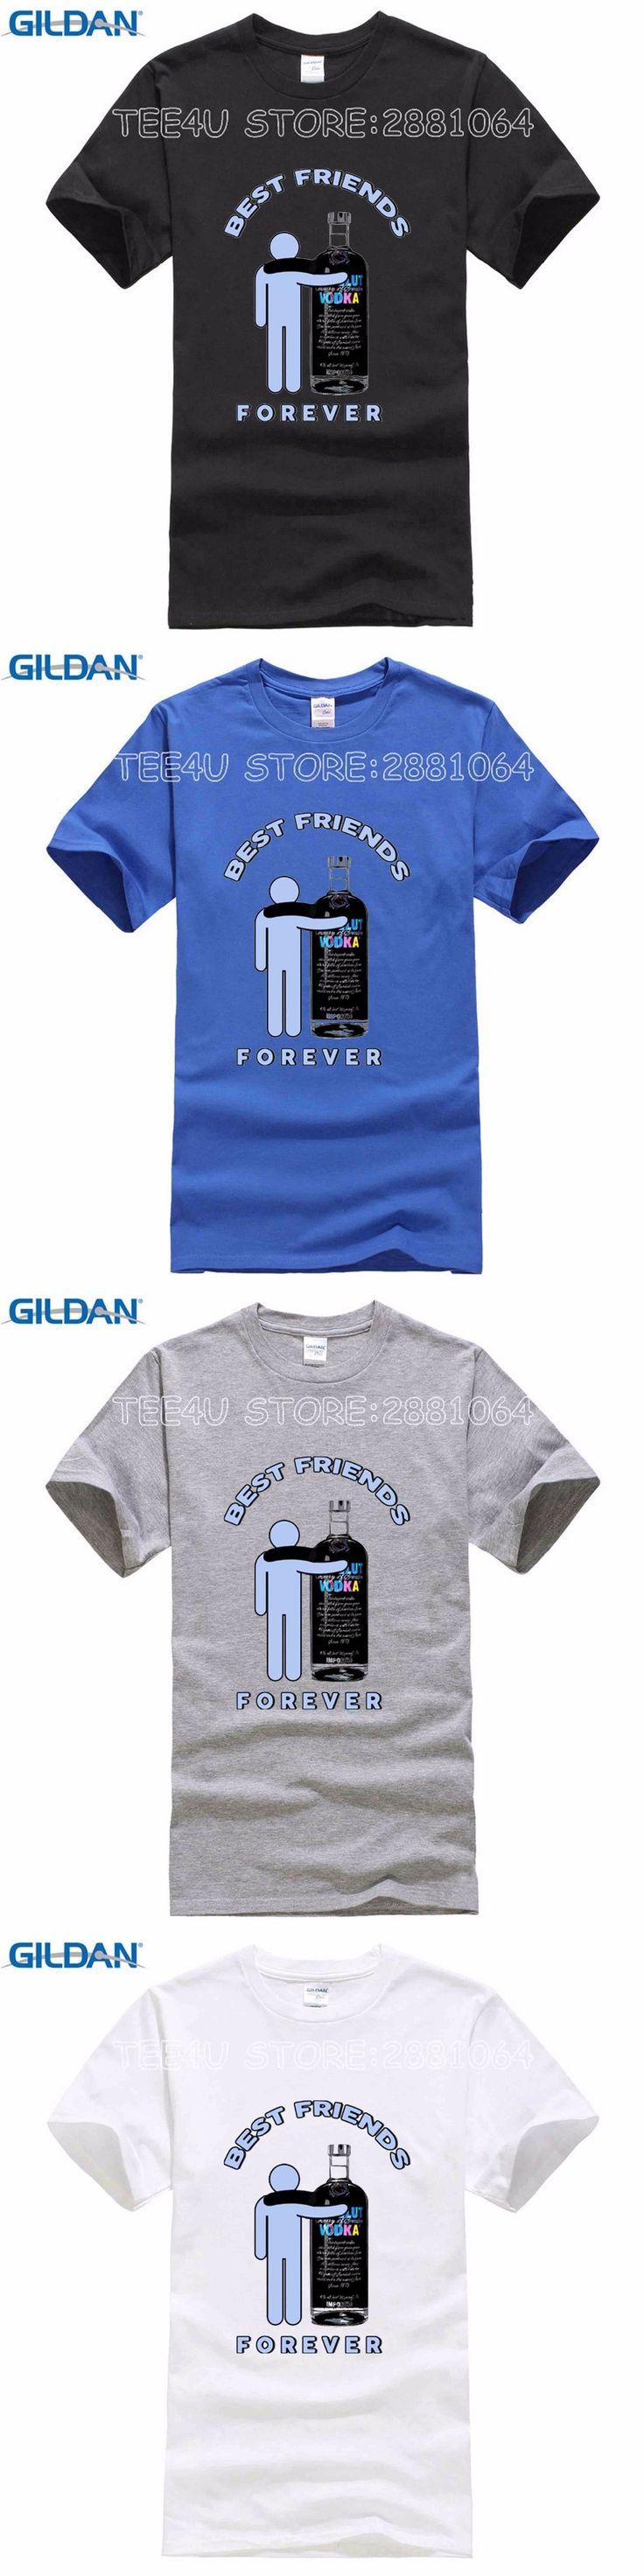 Best Friends Forever Print Long Sleeve T Shirt Men Russian Absolute Vodka Drinking Wine Male Autumn T-shirts Cotton Tee